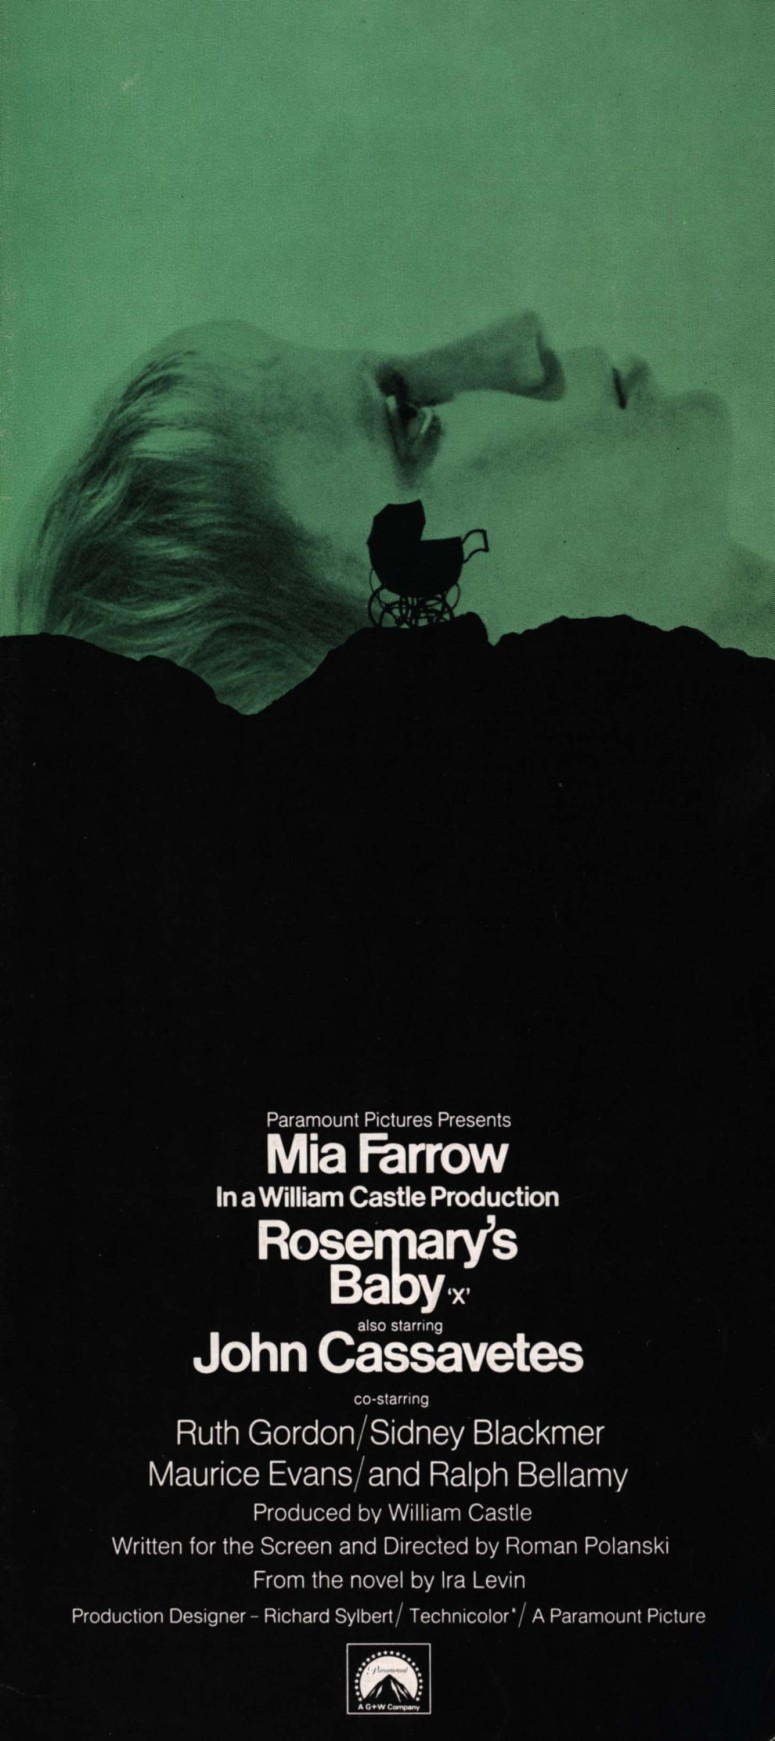 ROSEMARY'S BABY (US1968)